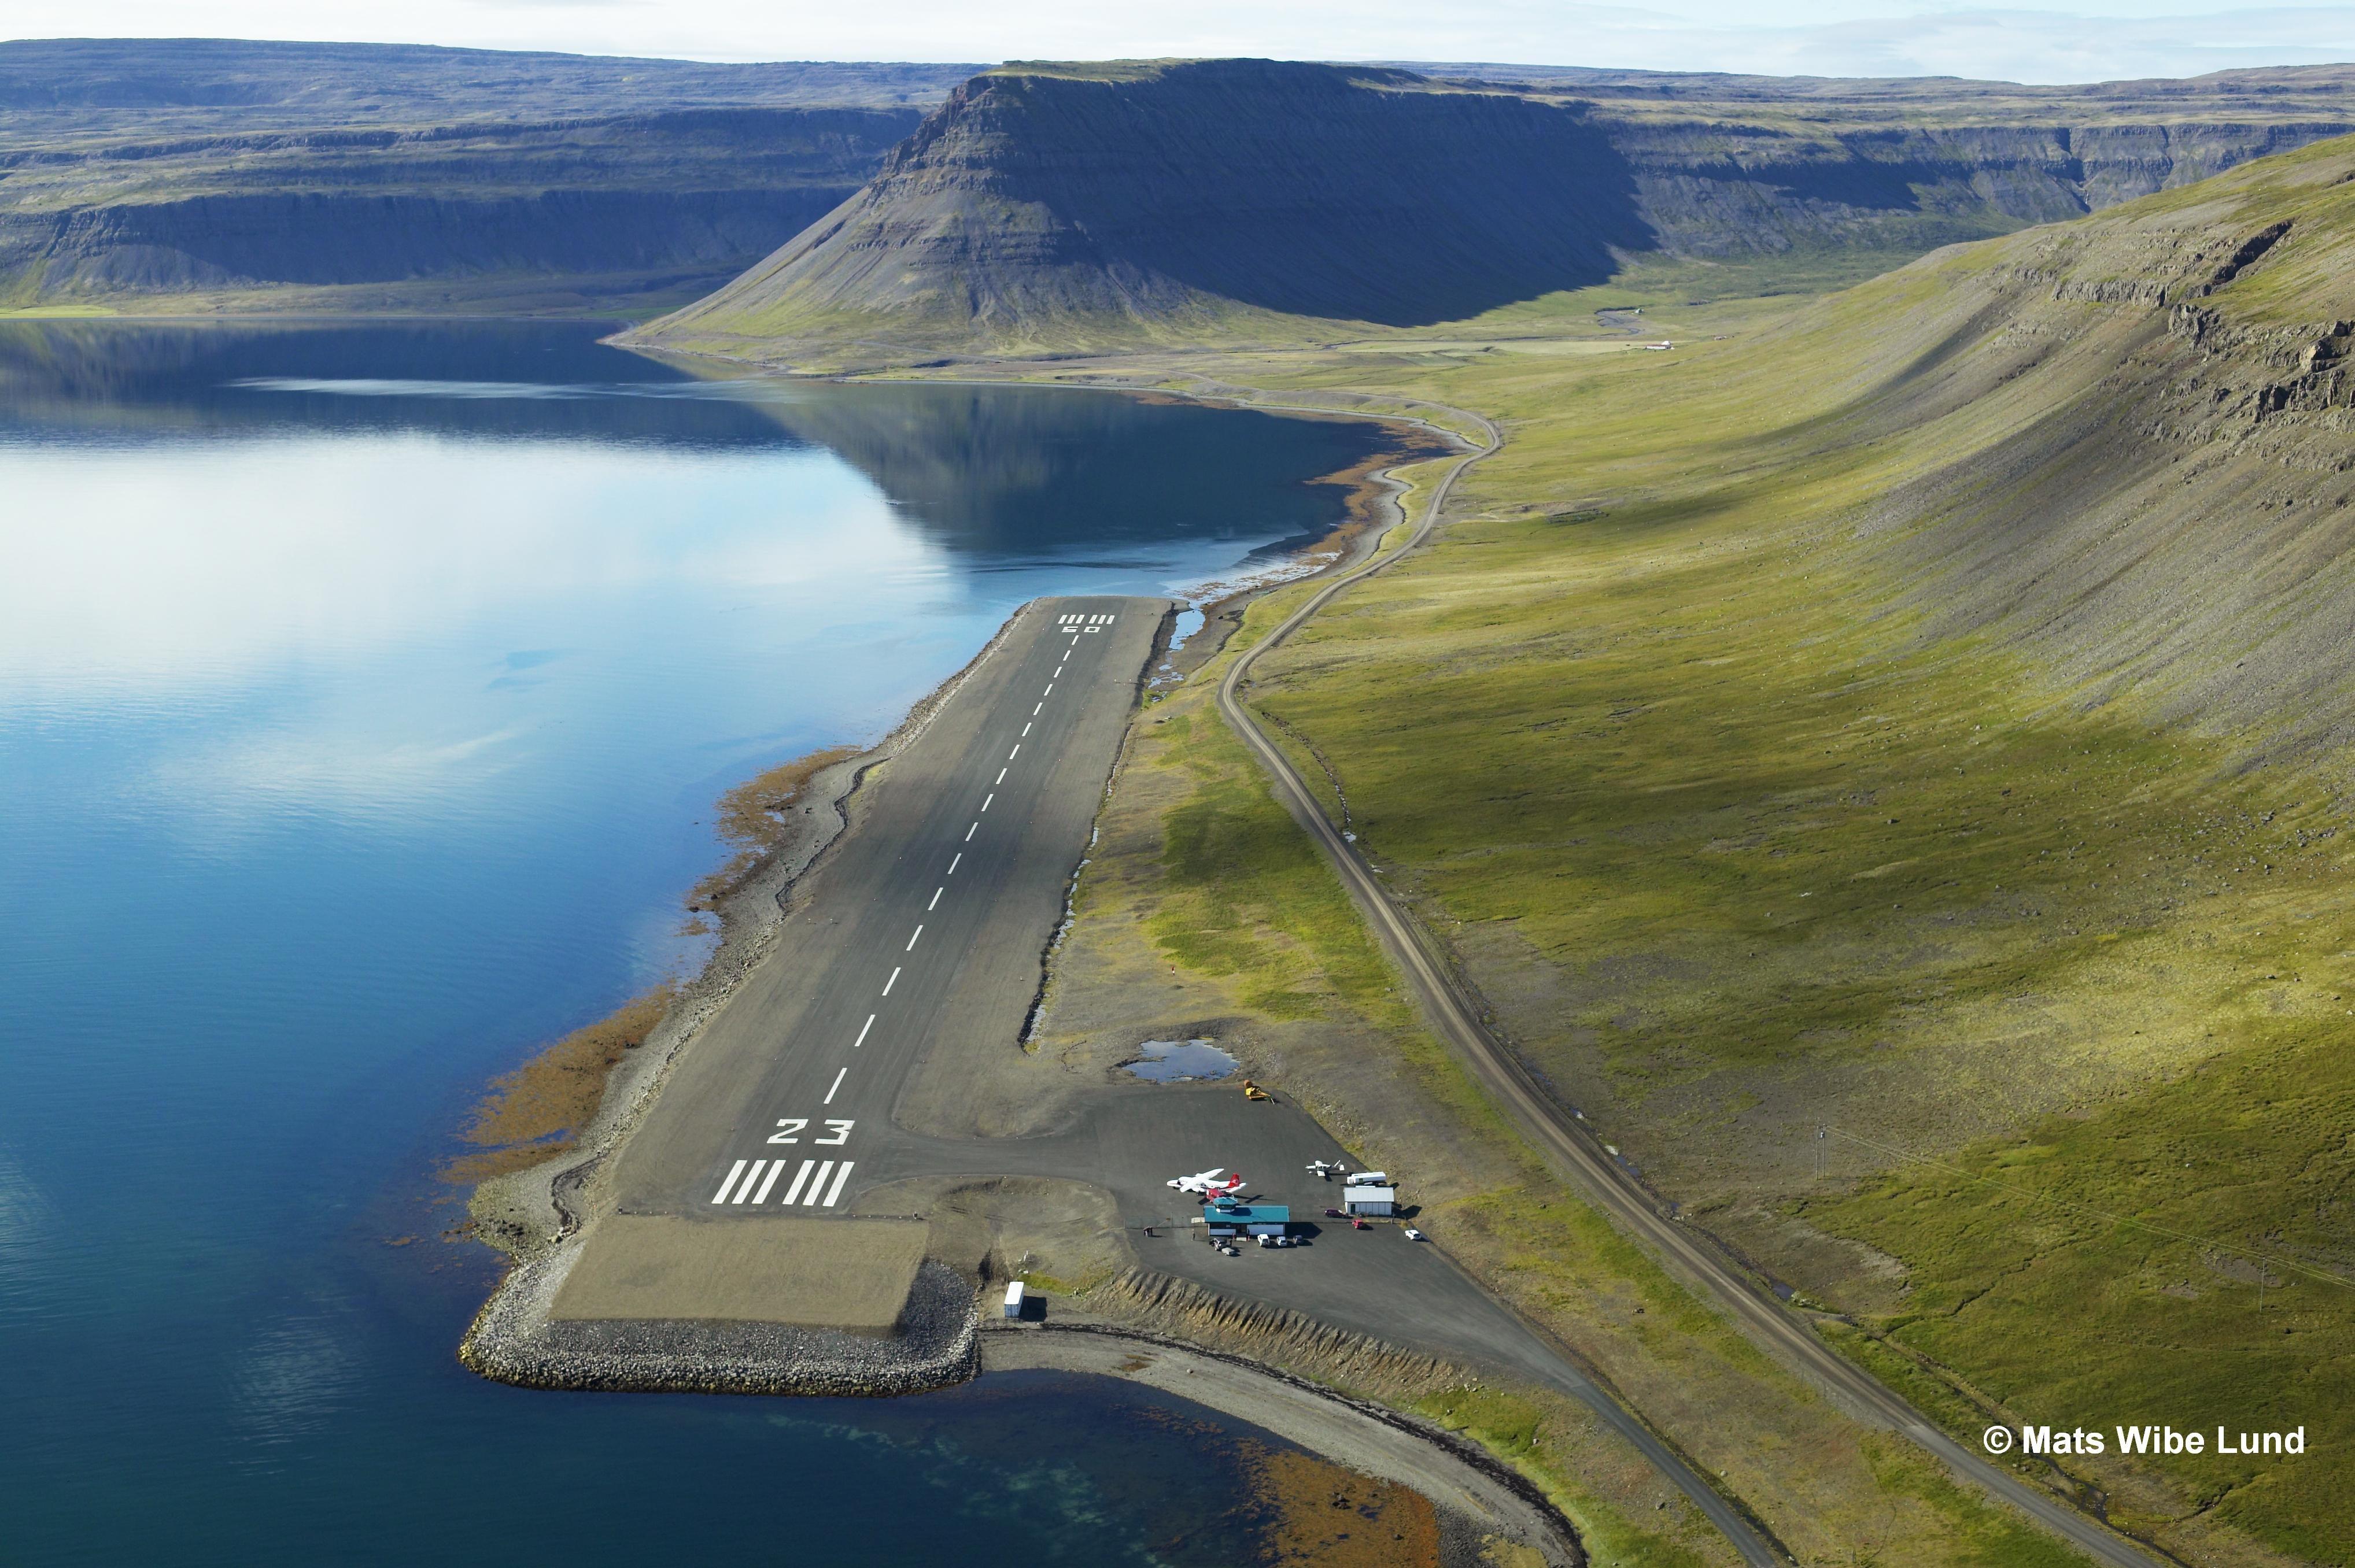 Aeroporto di Bíldudalur, Fiordi Occidentali di Islanda